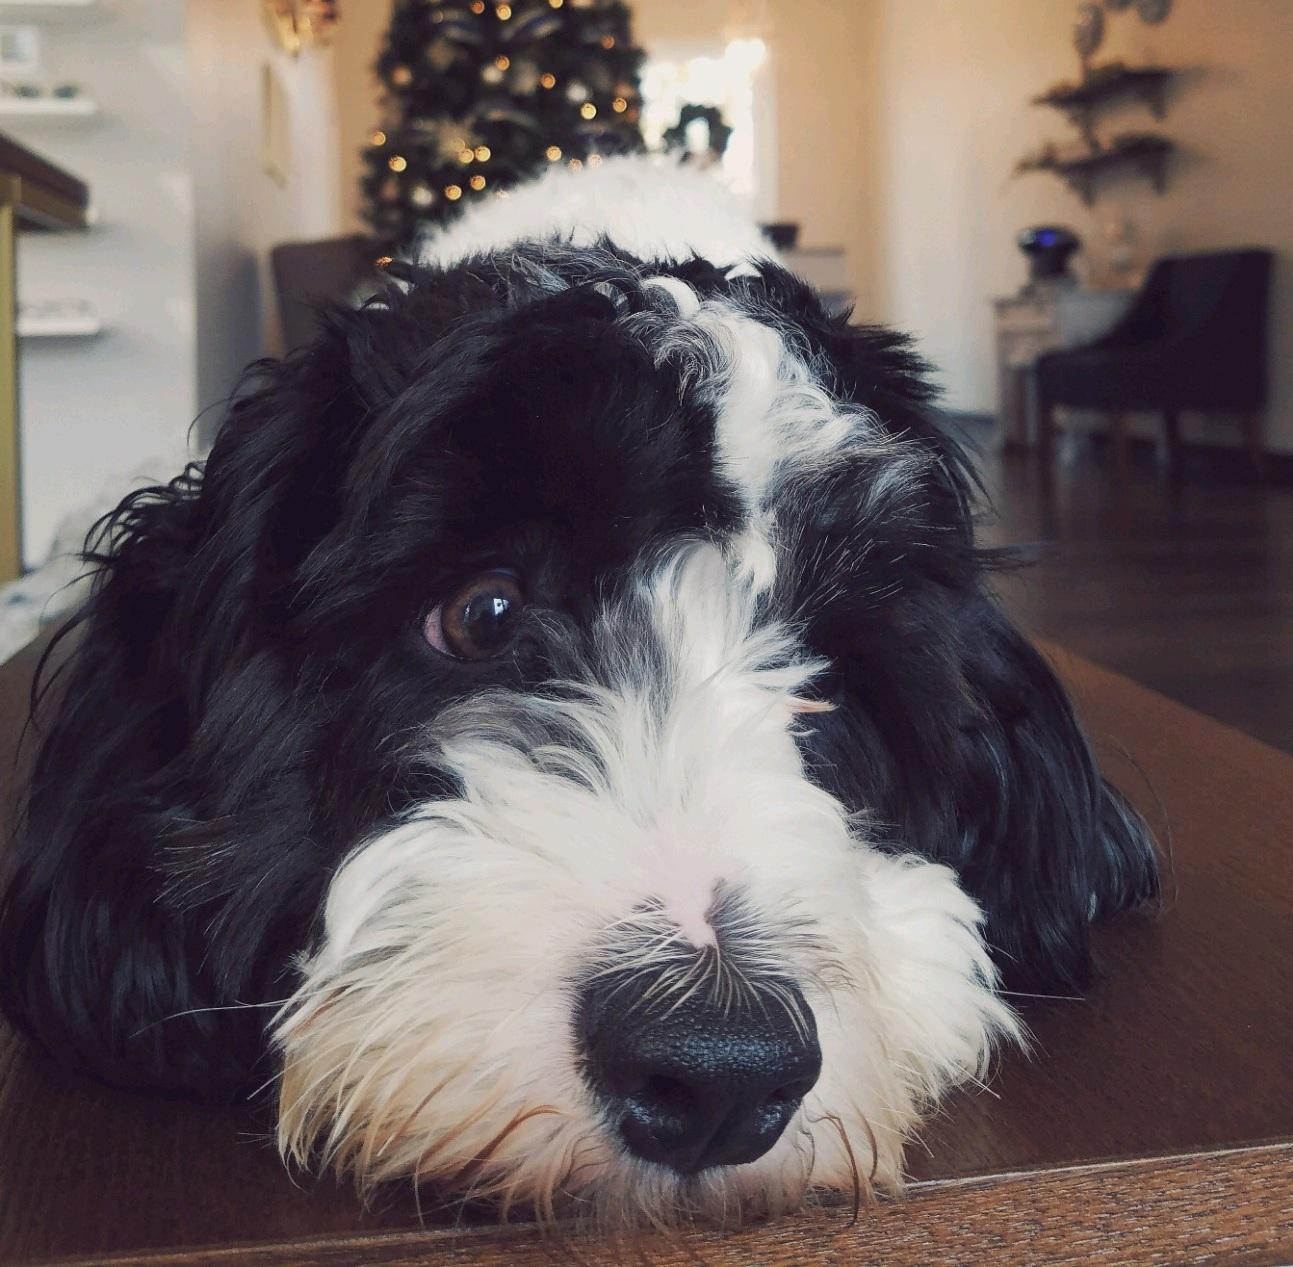 eye-doctor-winston-salem-office-dog.jpg